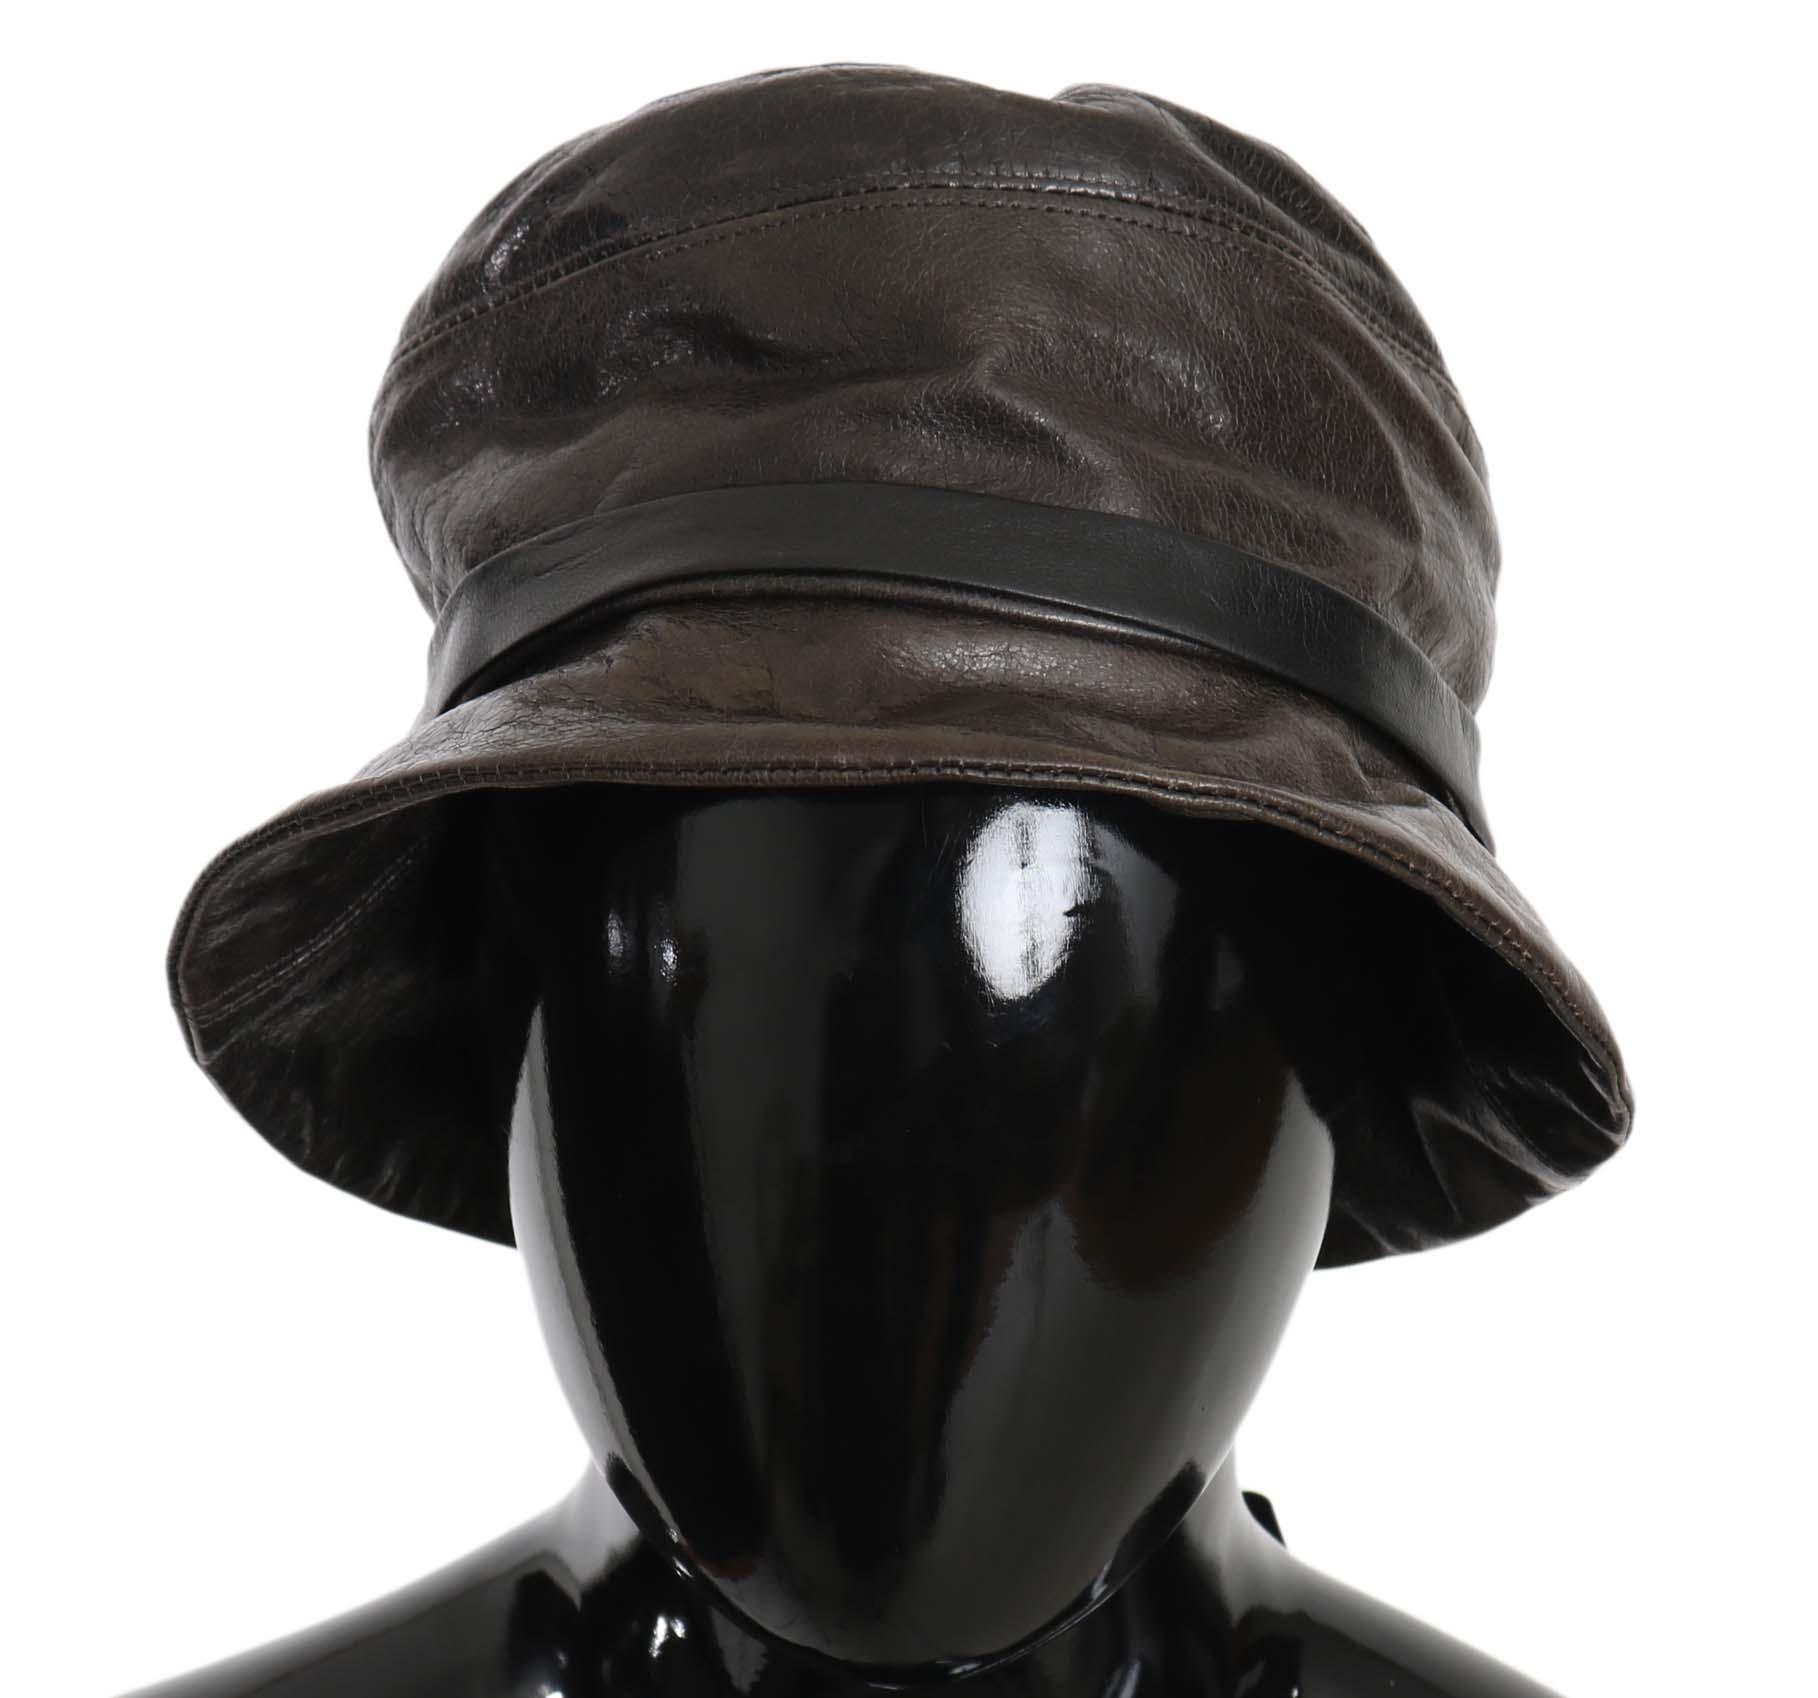 Dolce & Gabbana Women's Hat Brown HAT70217 - 56 cm|XS